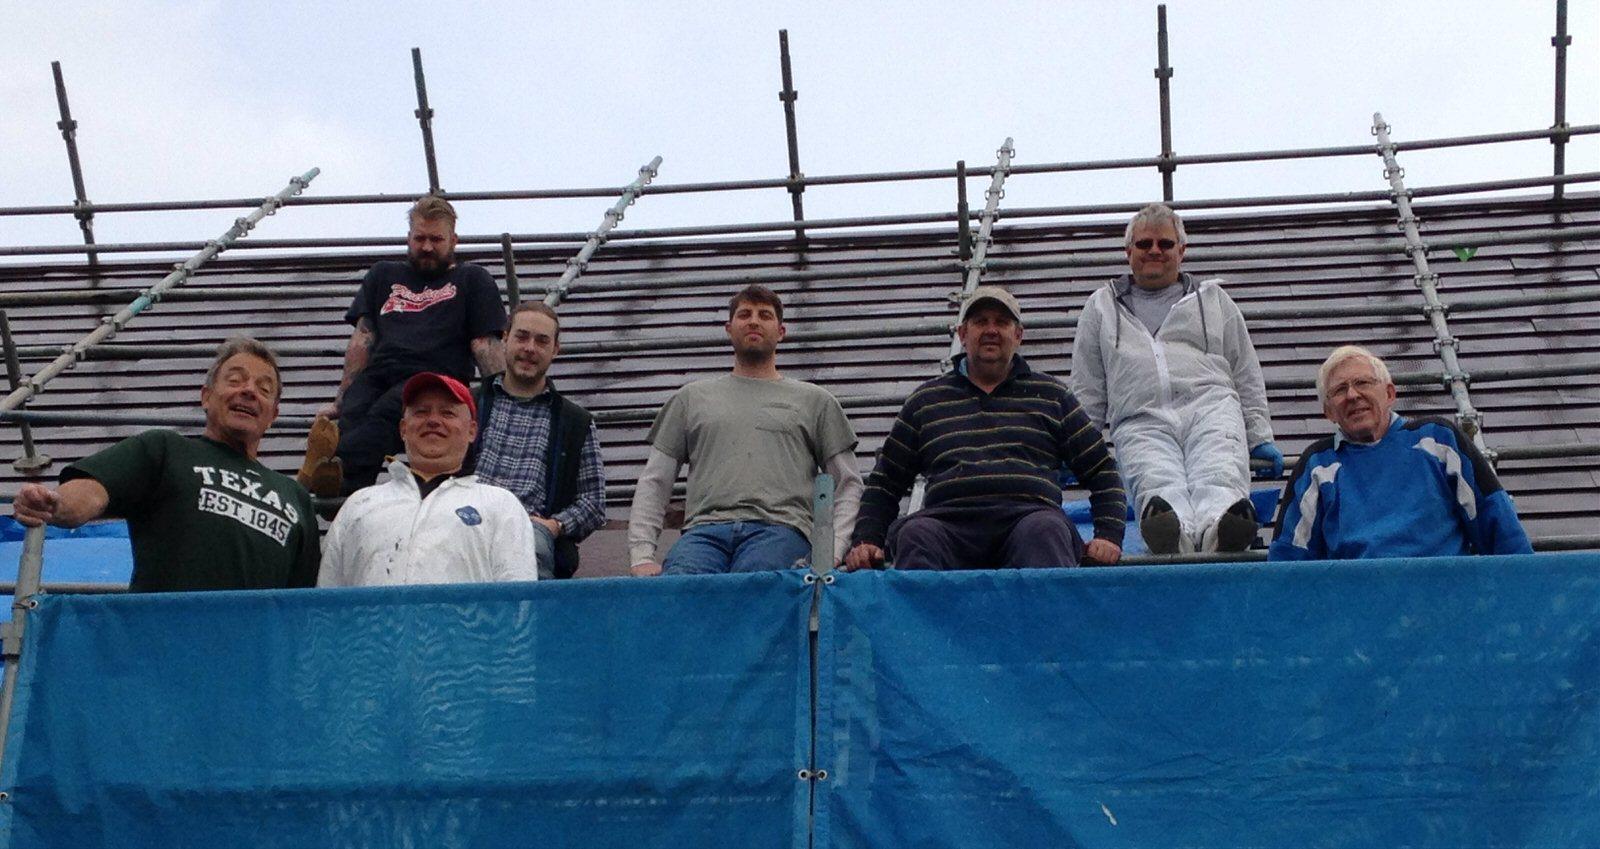 2016-04 Nozomi Work Team 1 CROPPED L to R Brian, James Benefiel, Gelu, Noah, Patrick, Liviu, Petre, Cal Cummings photo from Patrick Lewis